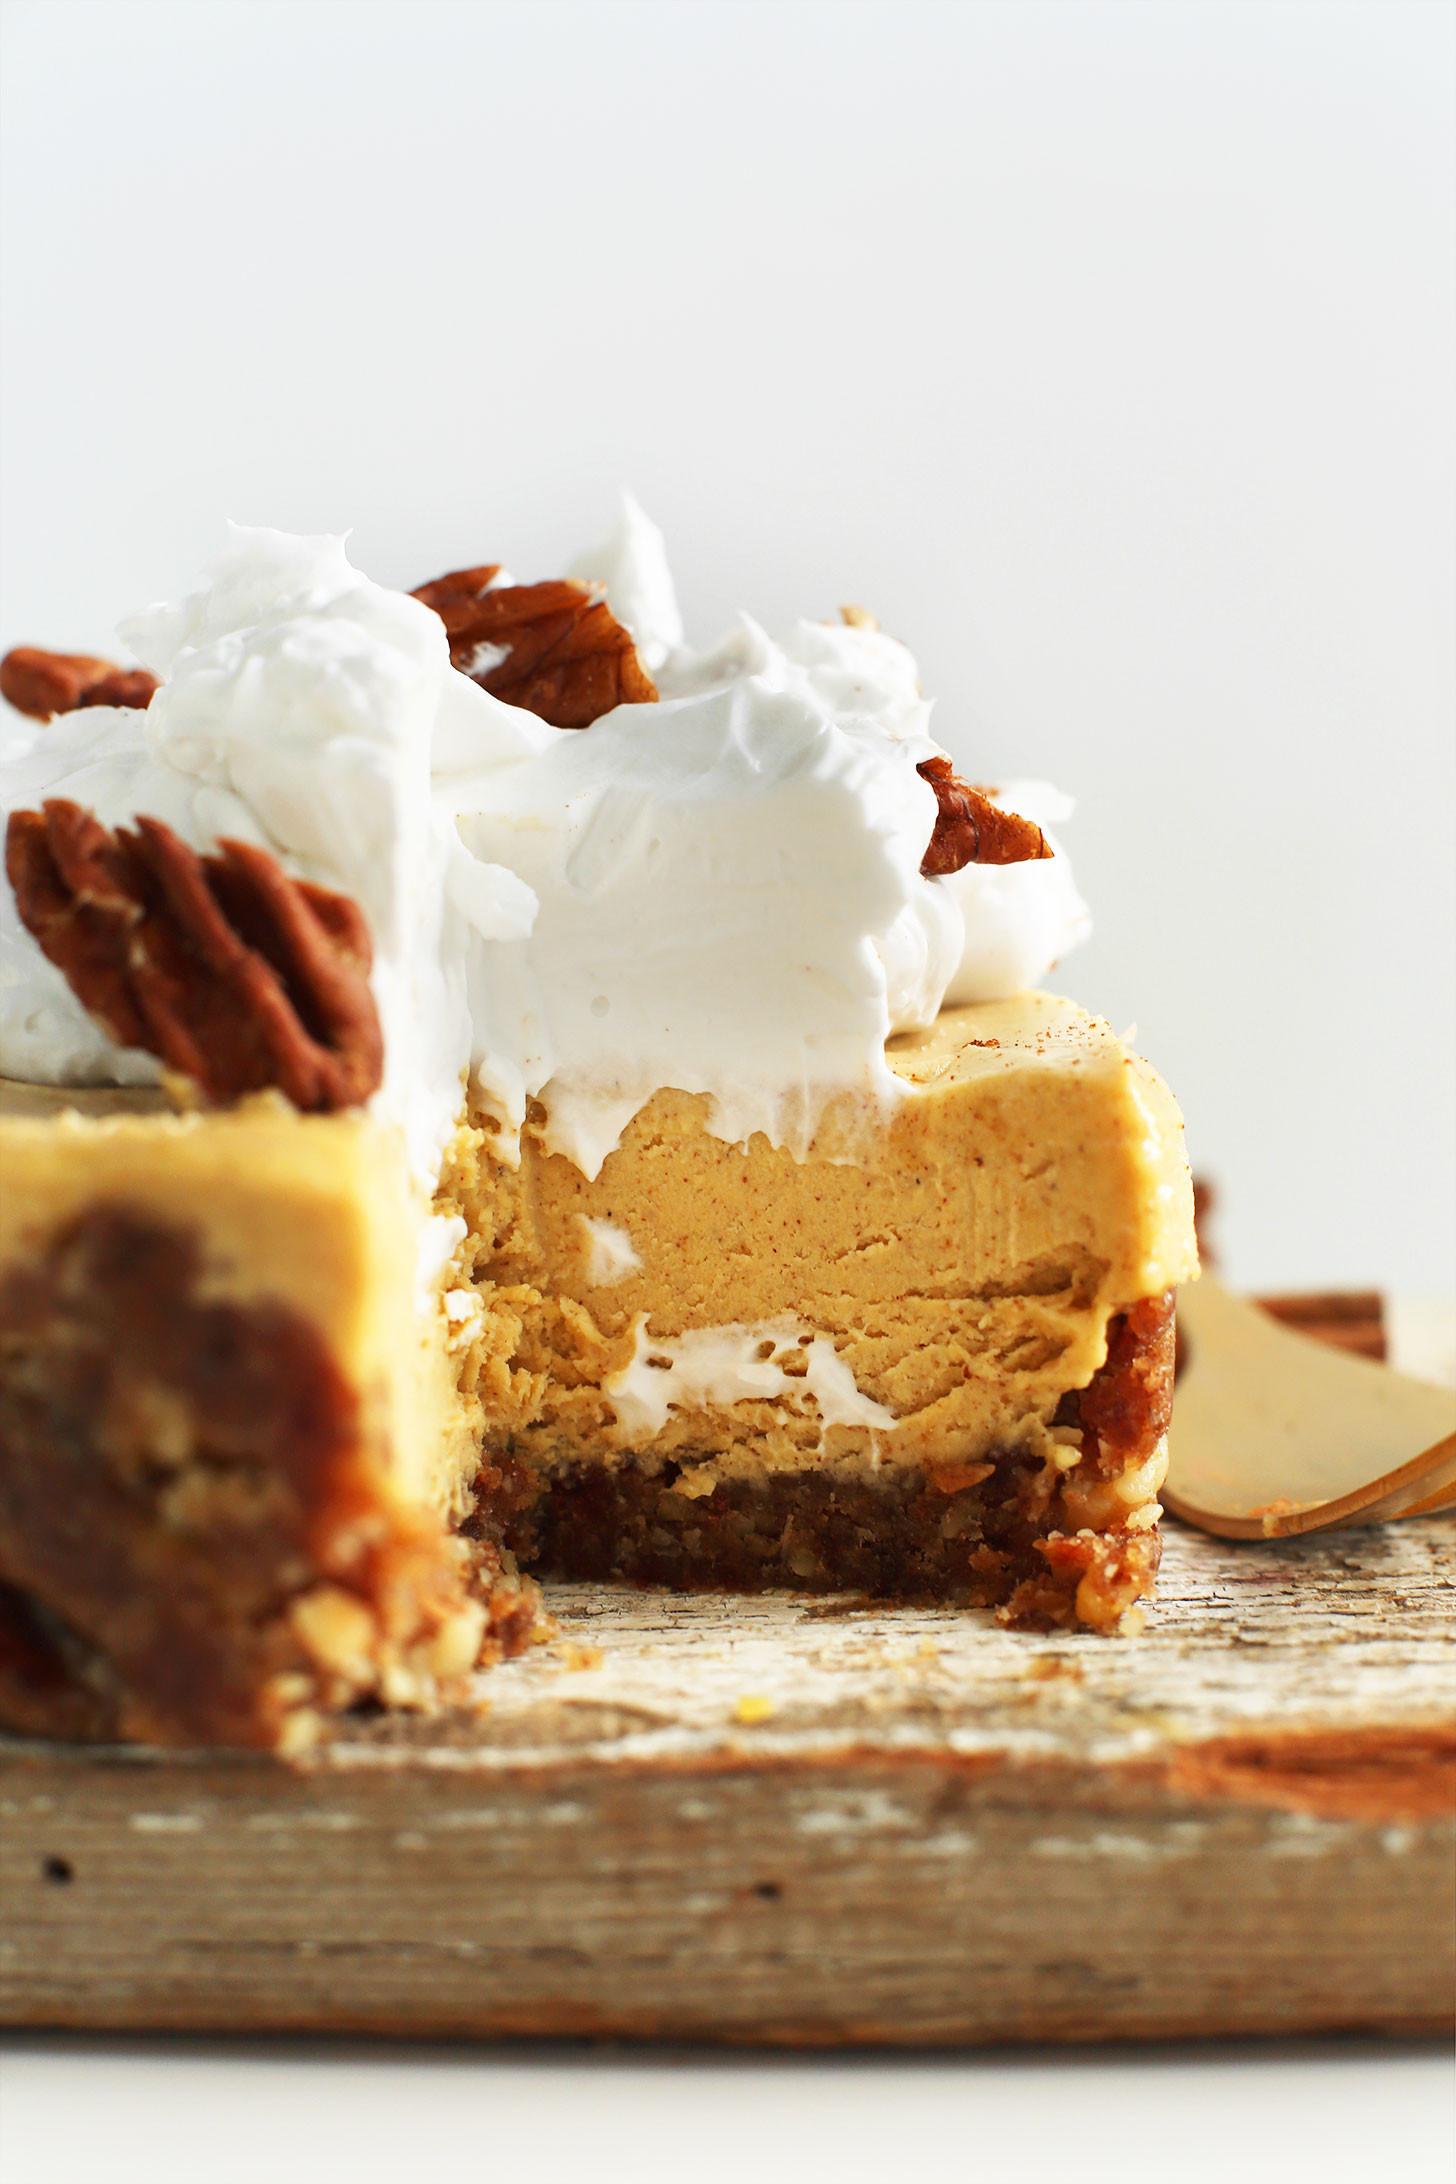 Healthy Vegan Cake Recipes  Vegan Pumpkin Cheesecake